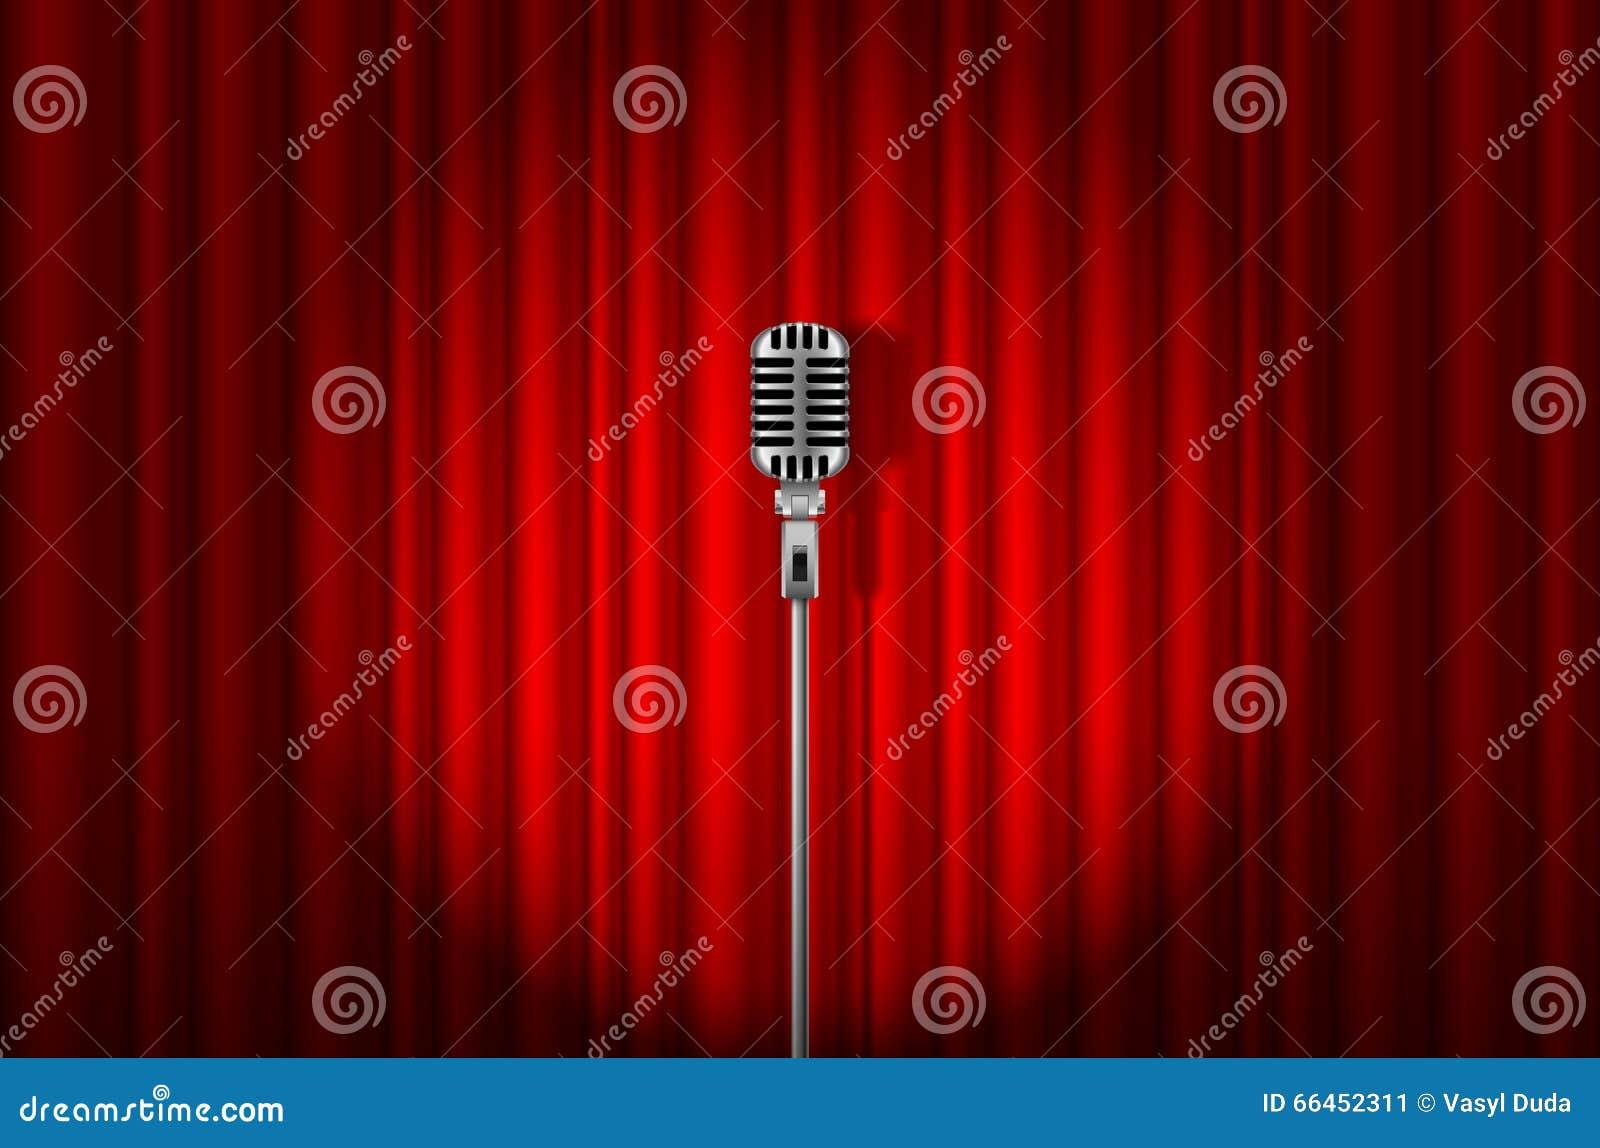 how to change microphone settings red karaoke